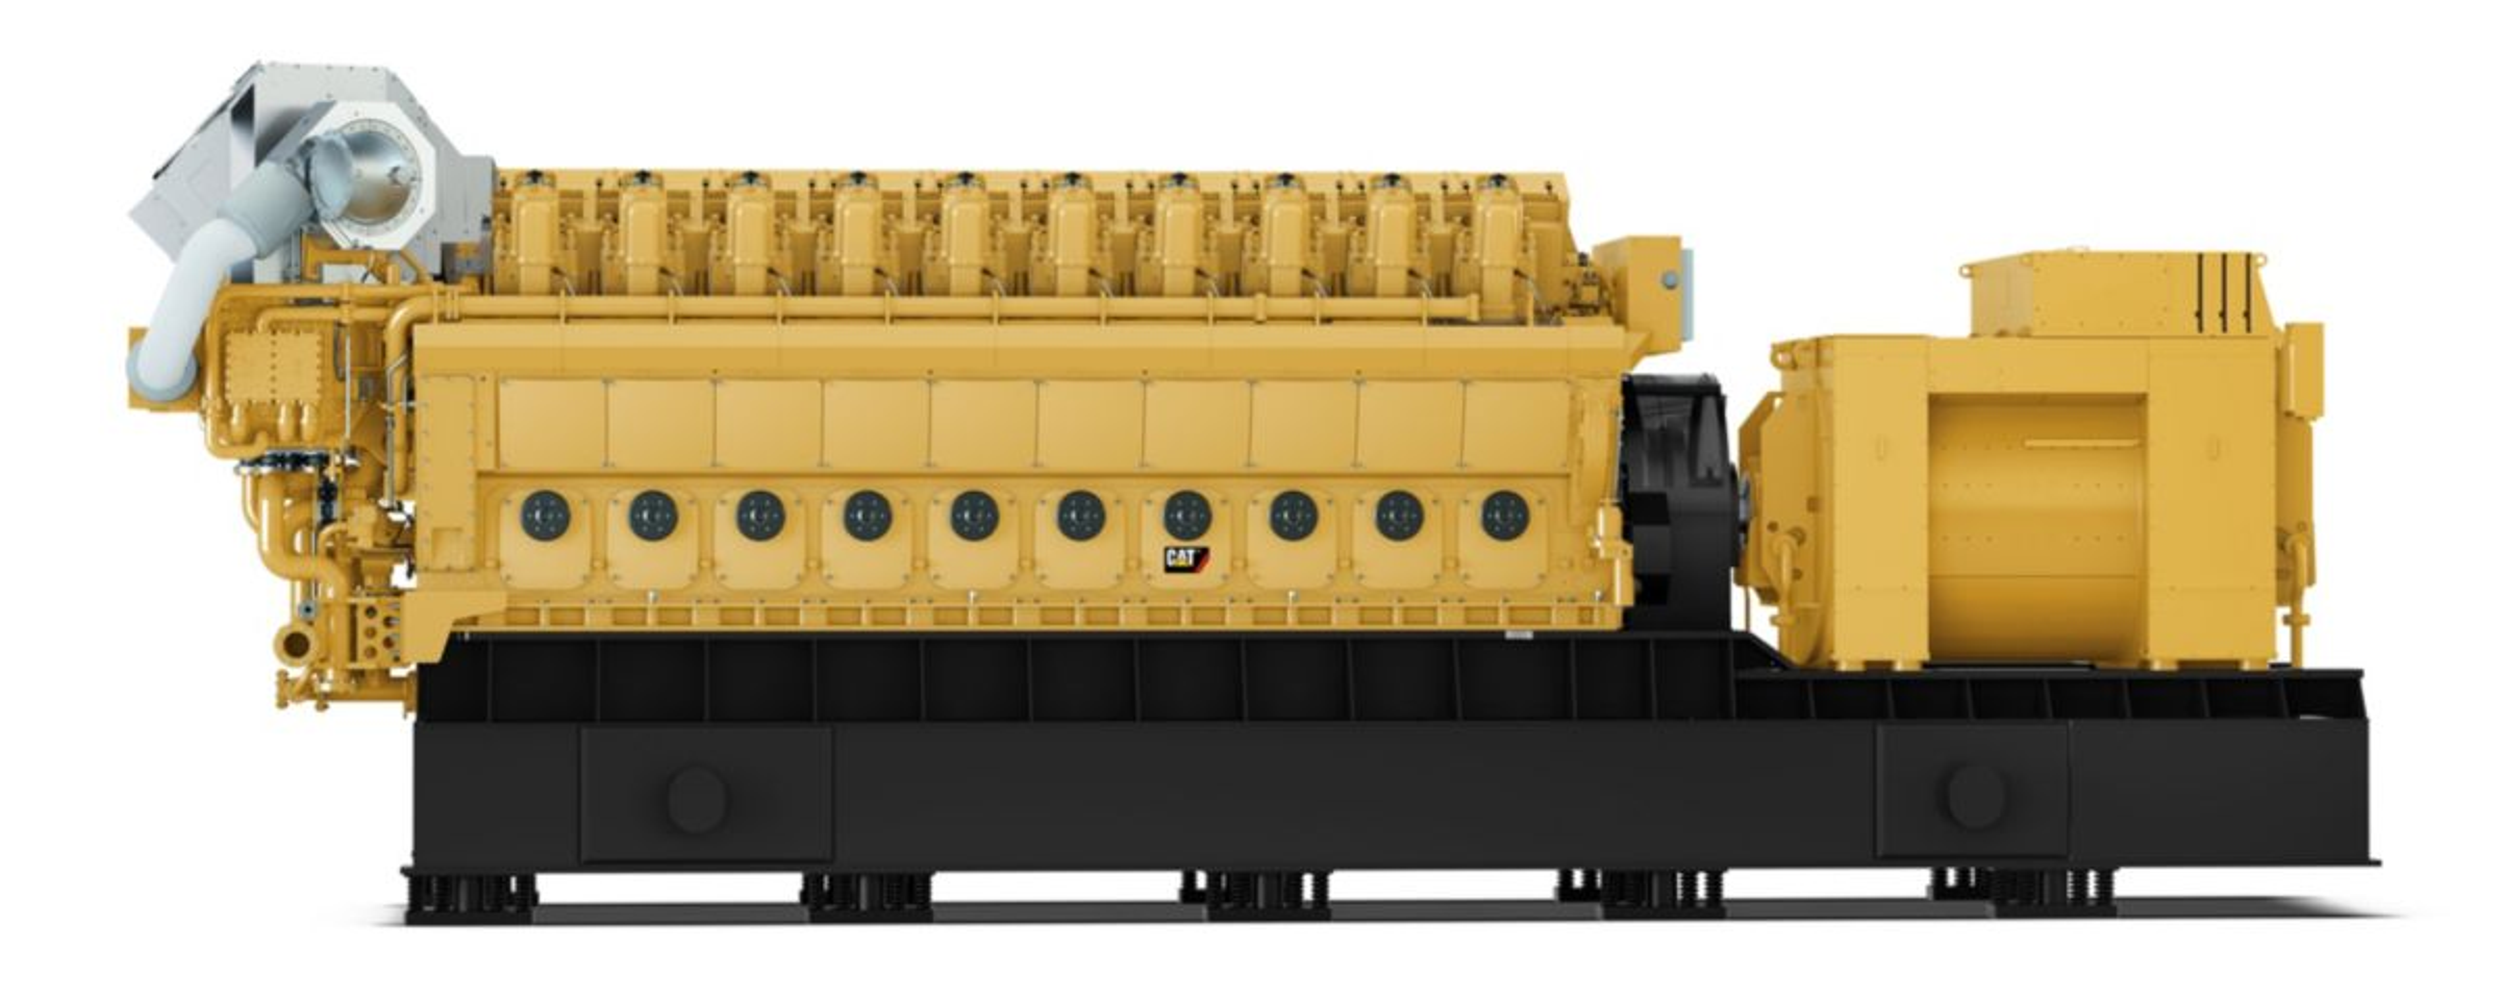 GCM34 Left view, Electronic Power Generator Sets>